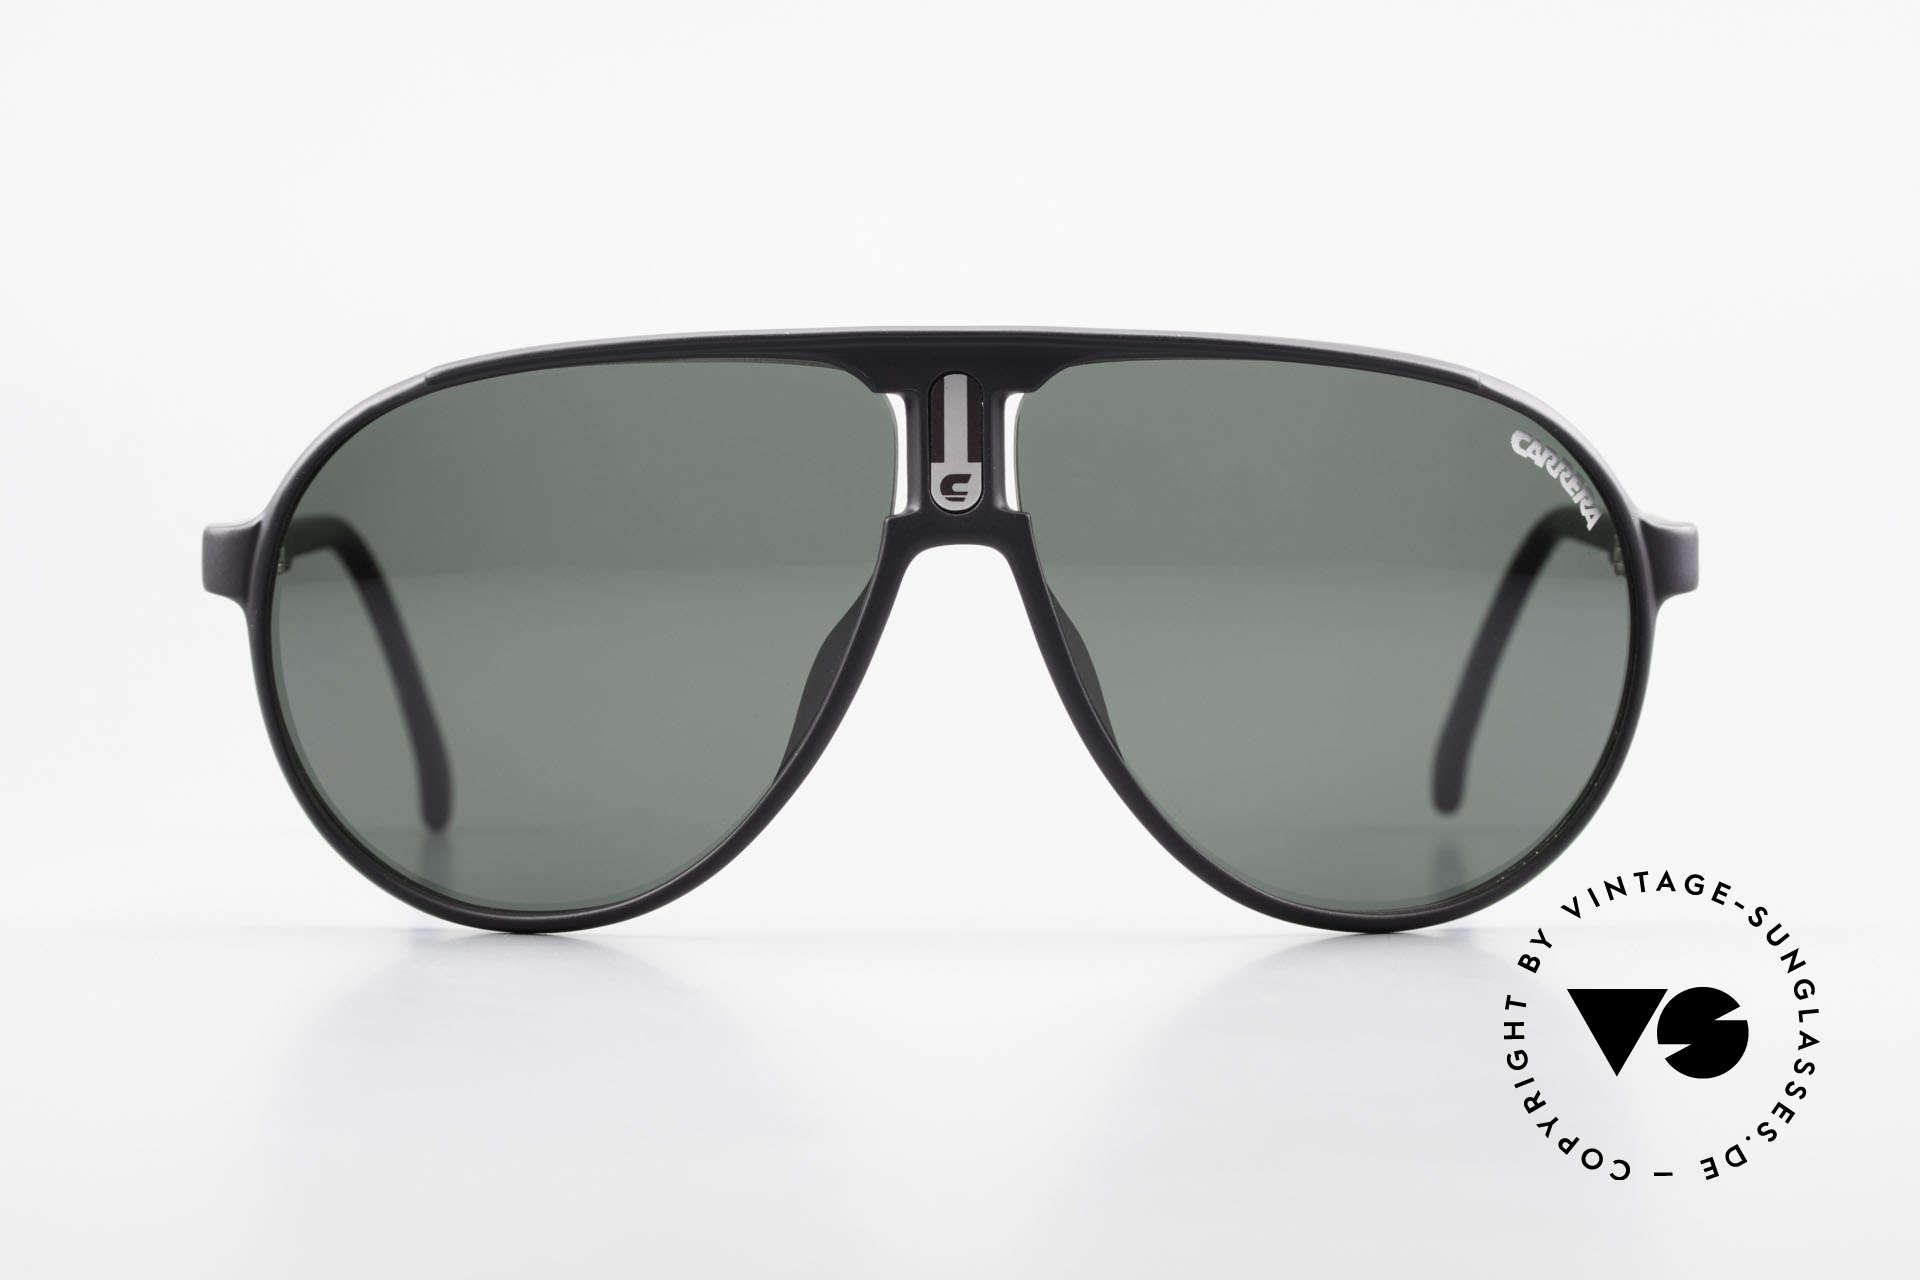 Carrera 5407 80's Sports Pilot's Sunglasses, orig. 80's catalog name: Carrera 5407 CHAMPION, Made for Men